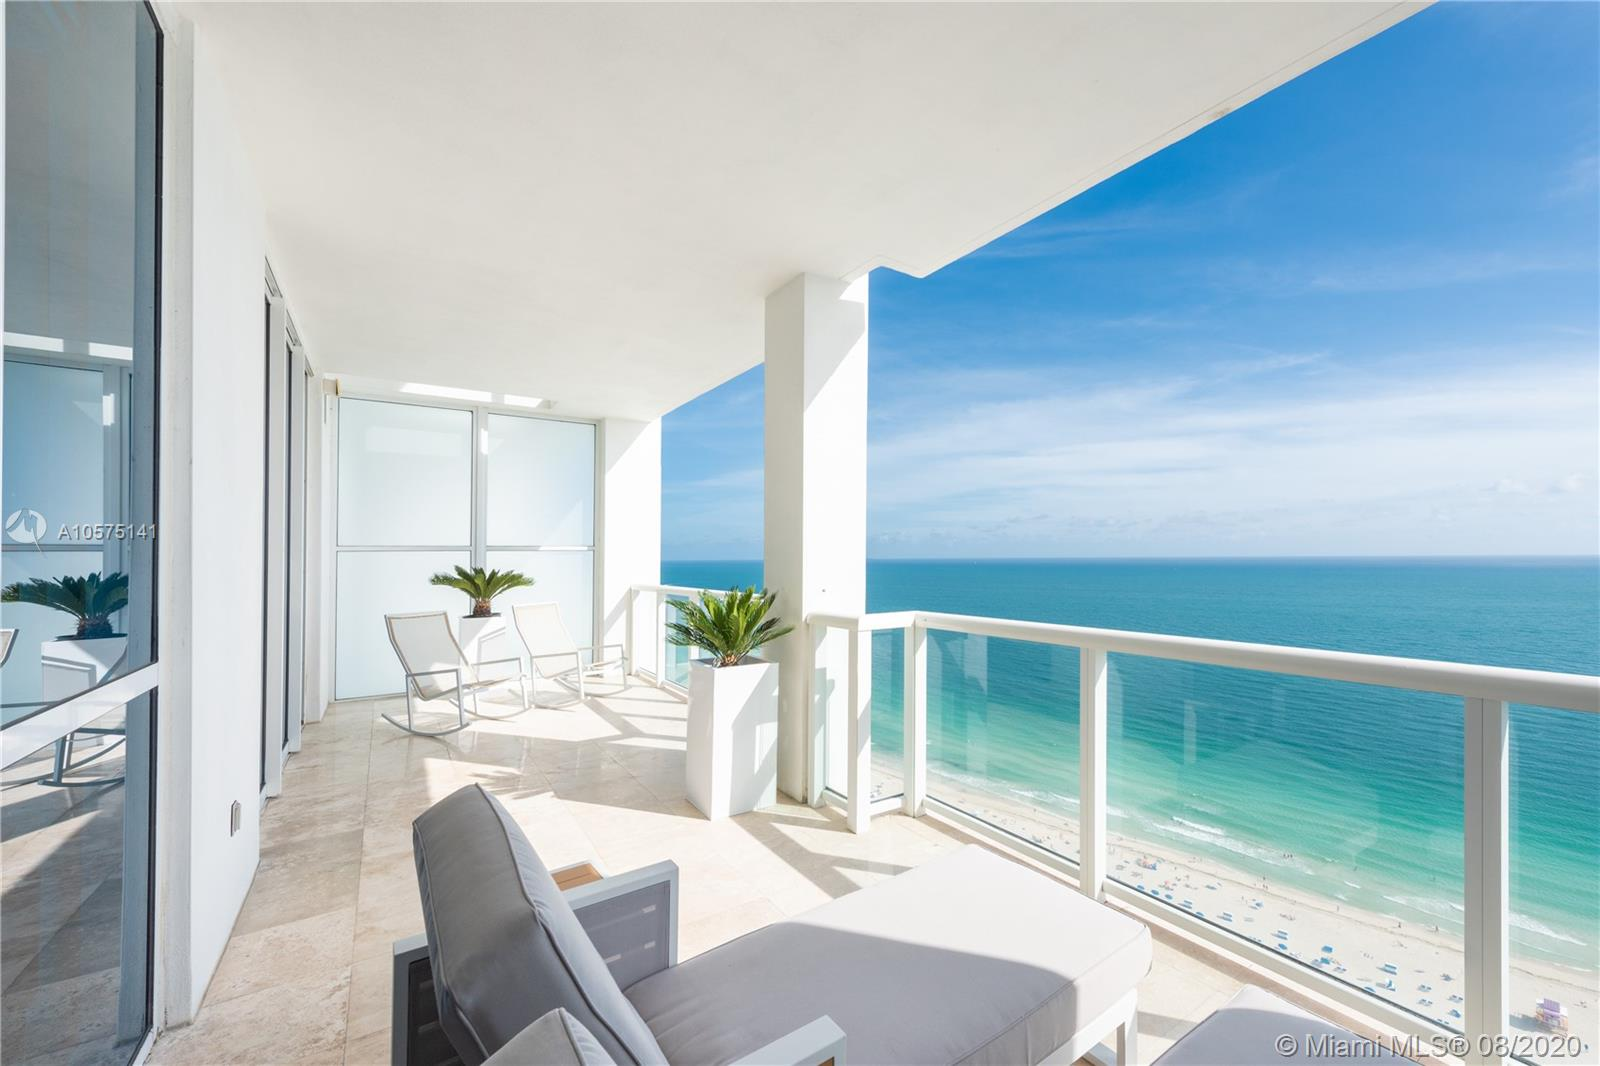 Continuum North #3302 - 50 S Pointe Dr #3302, Miami Beach, FL 33139